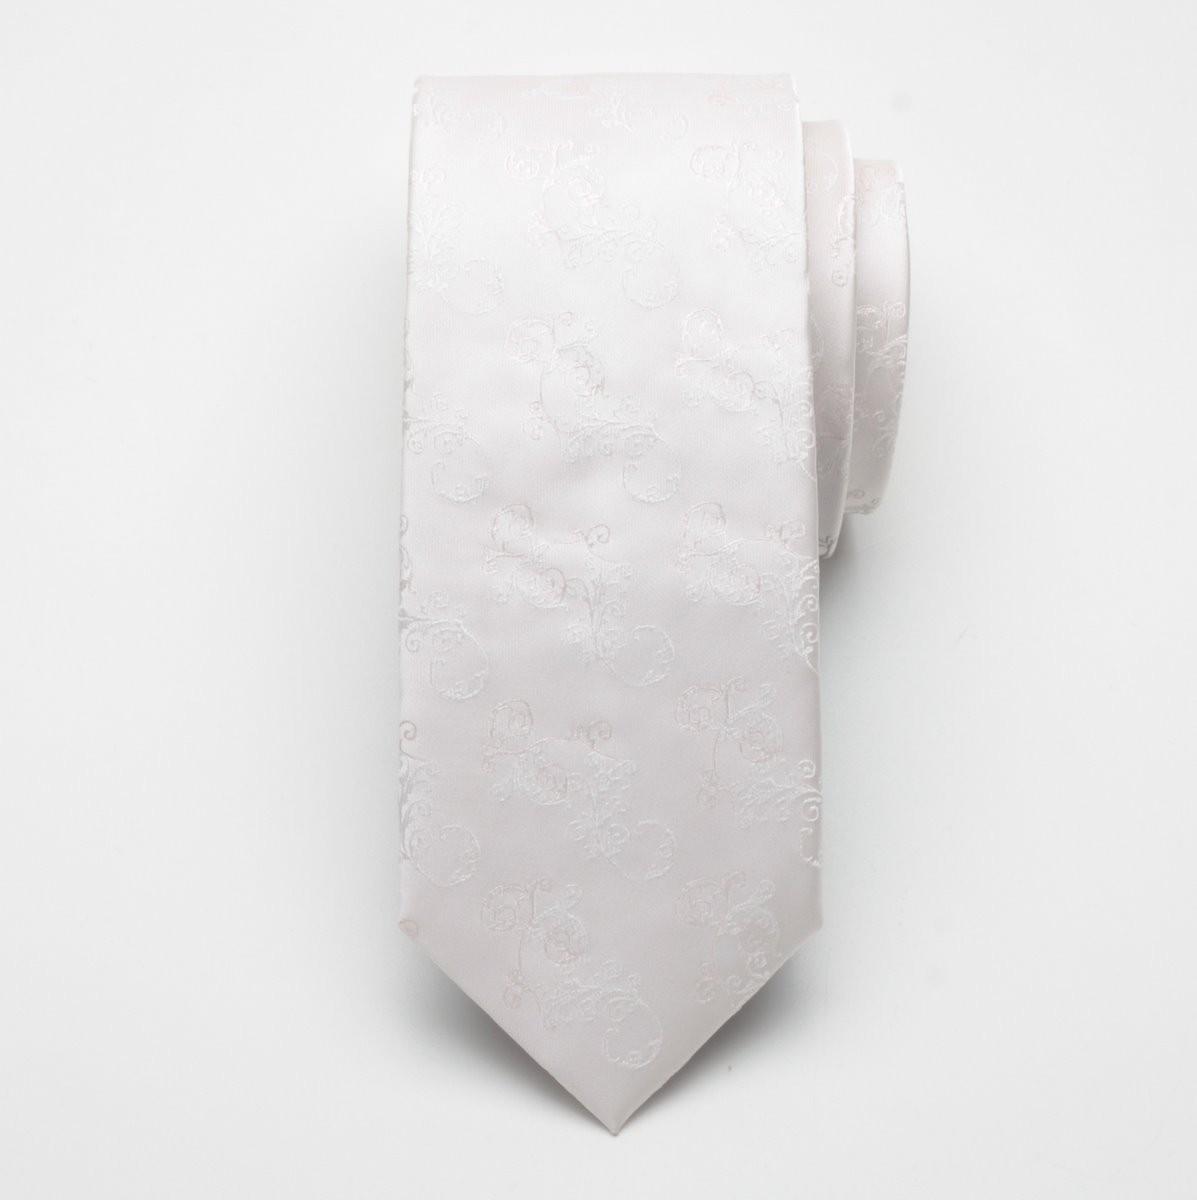 Krawat ślubny (wzór 5)